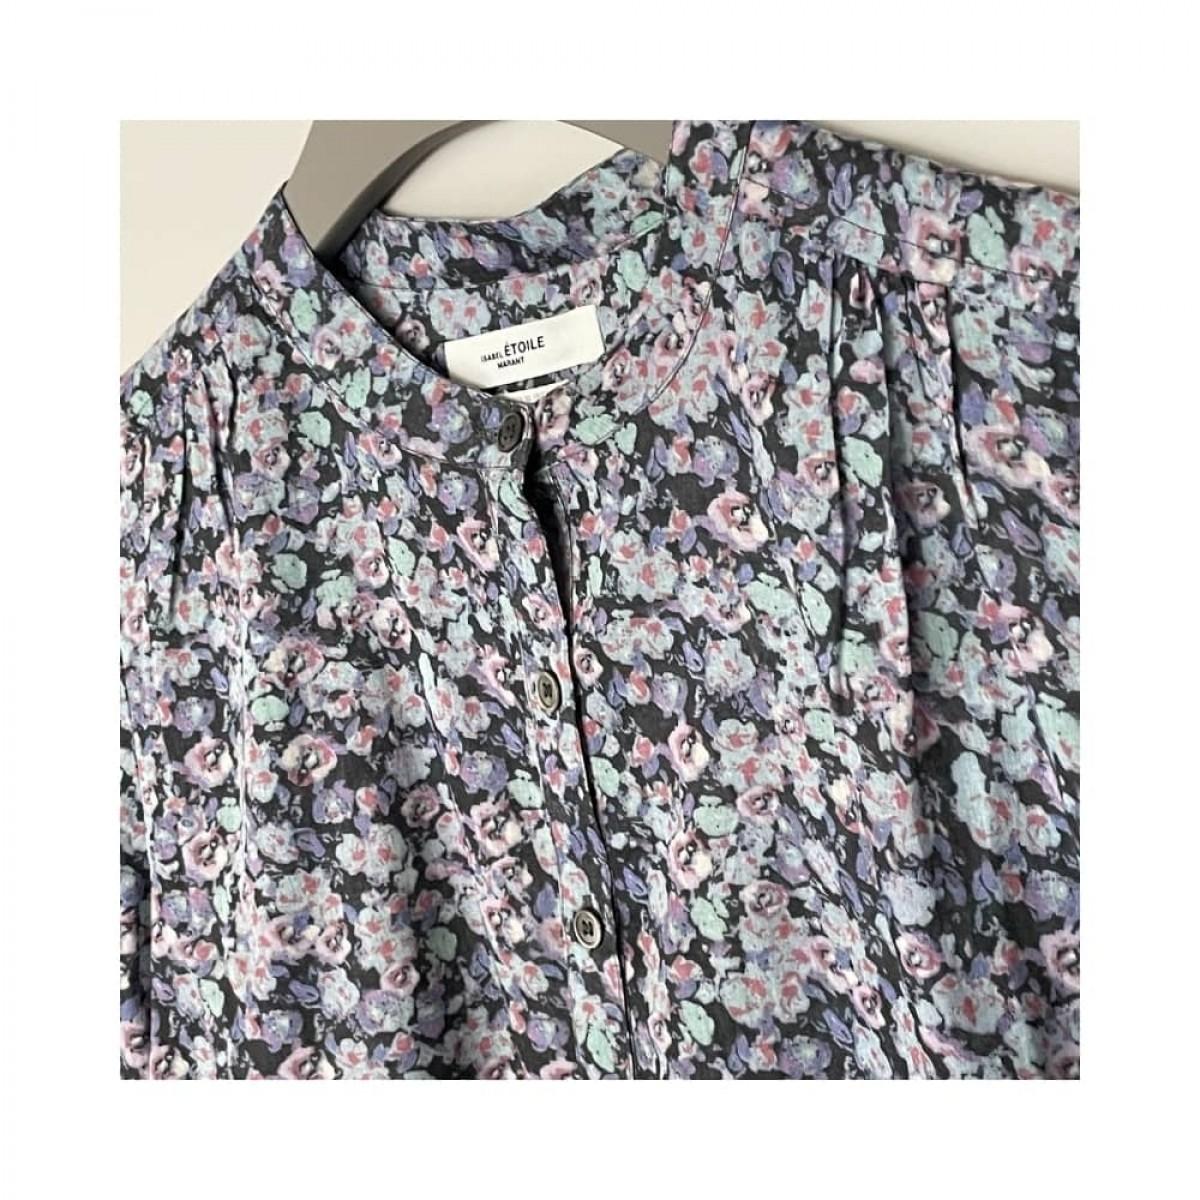 maria skjorte - multi color - print detalje